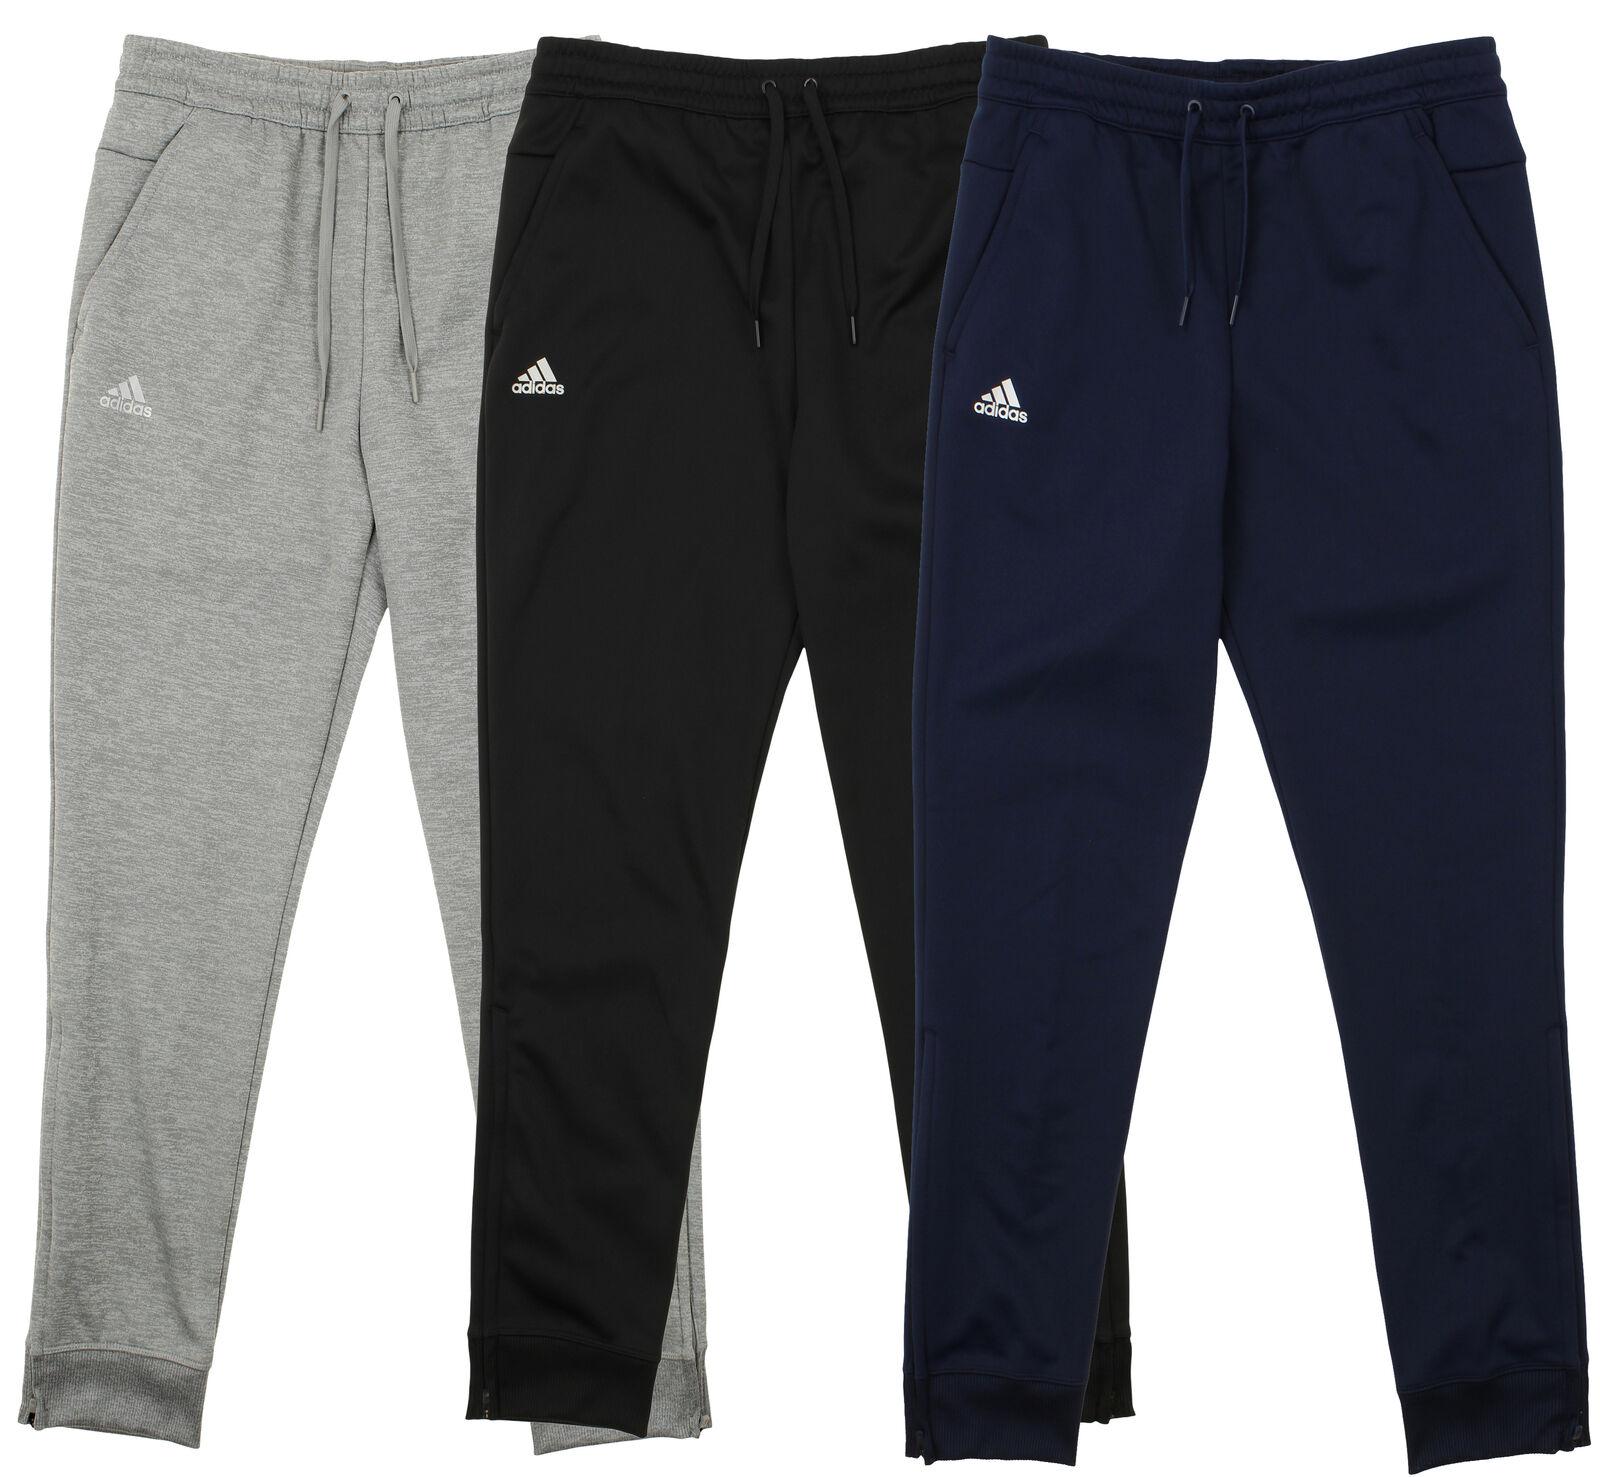 Adidas Men's Team Fleece Jogger Pants, color Options